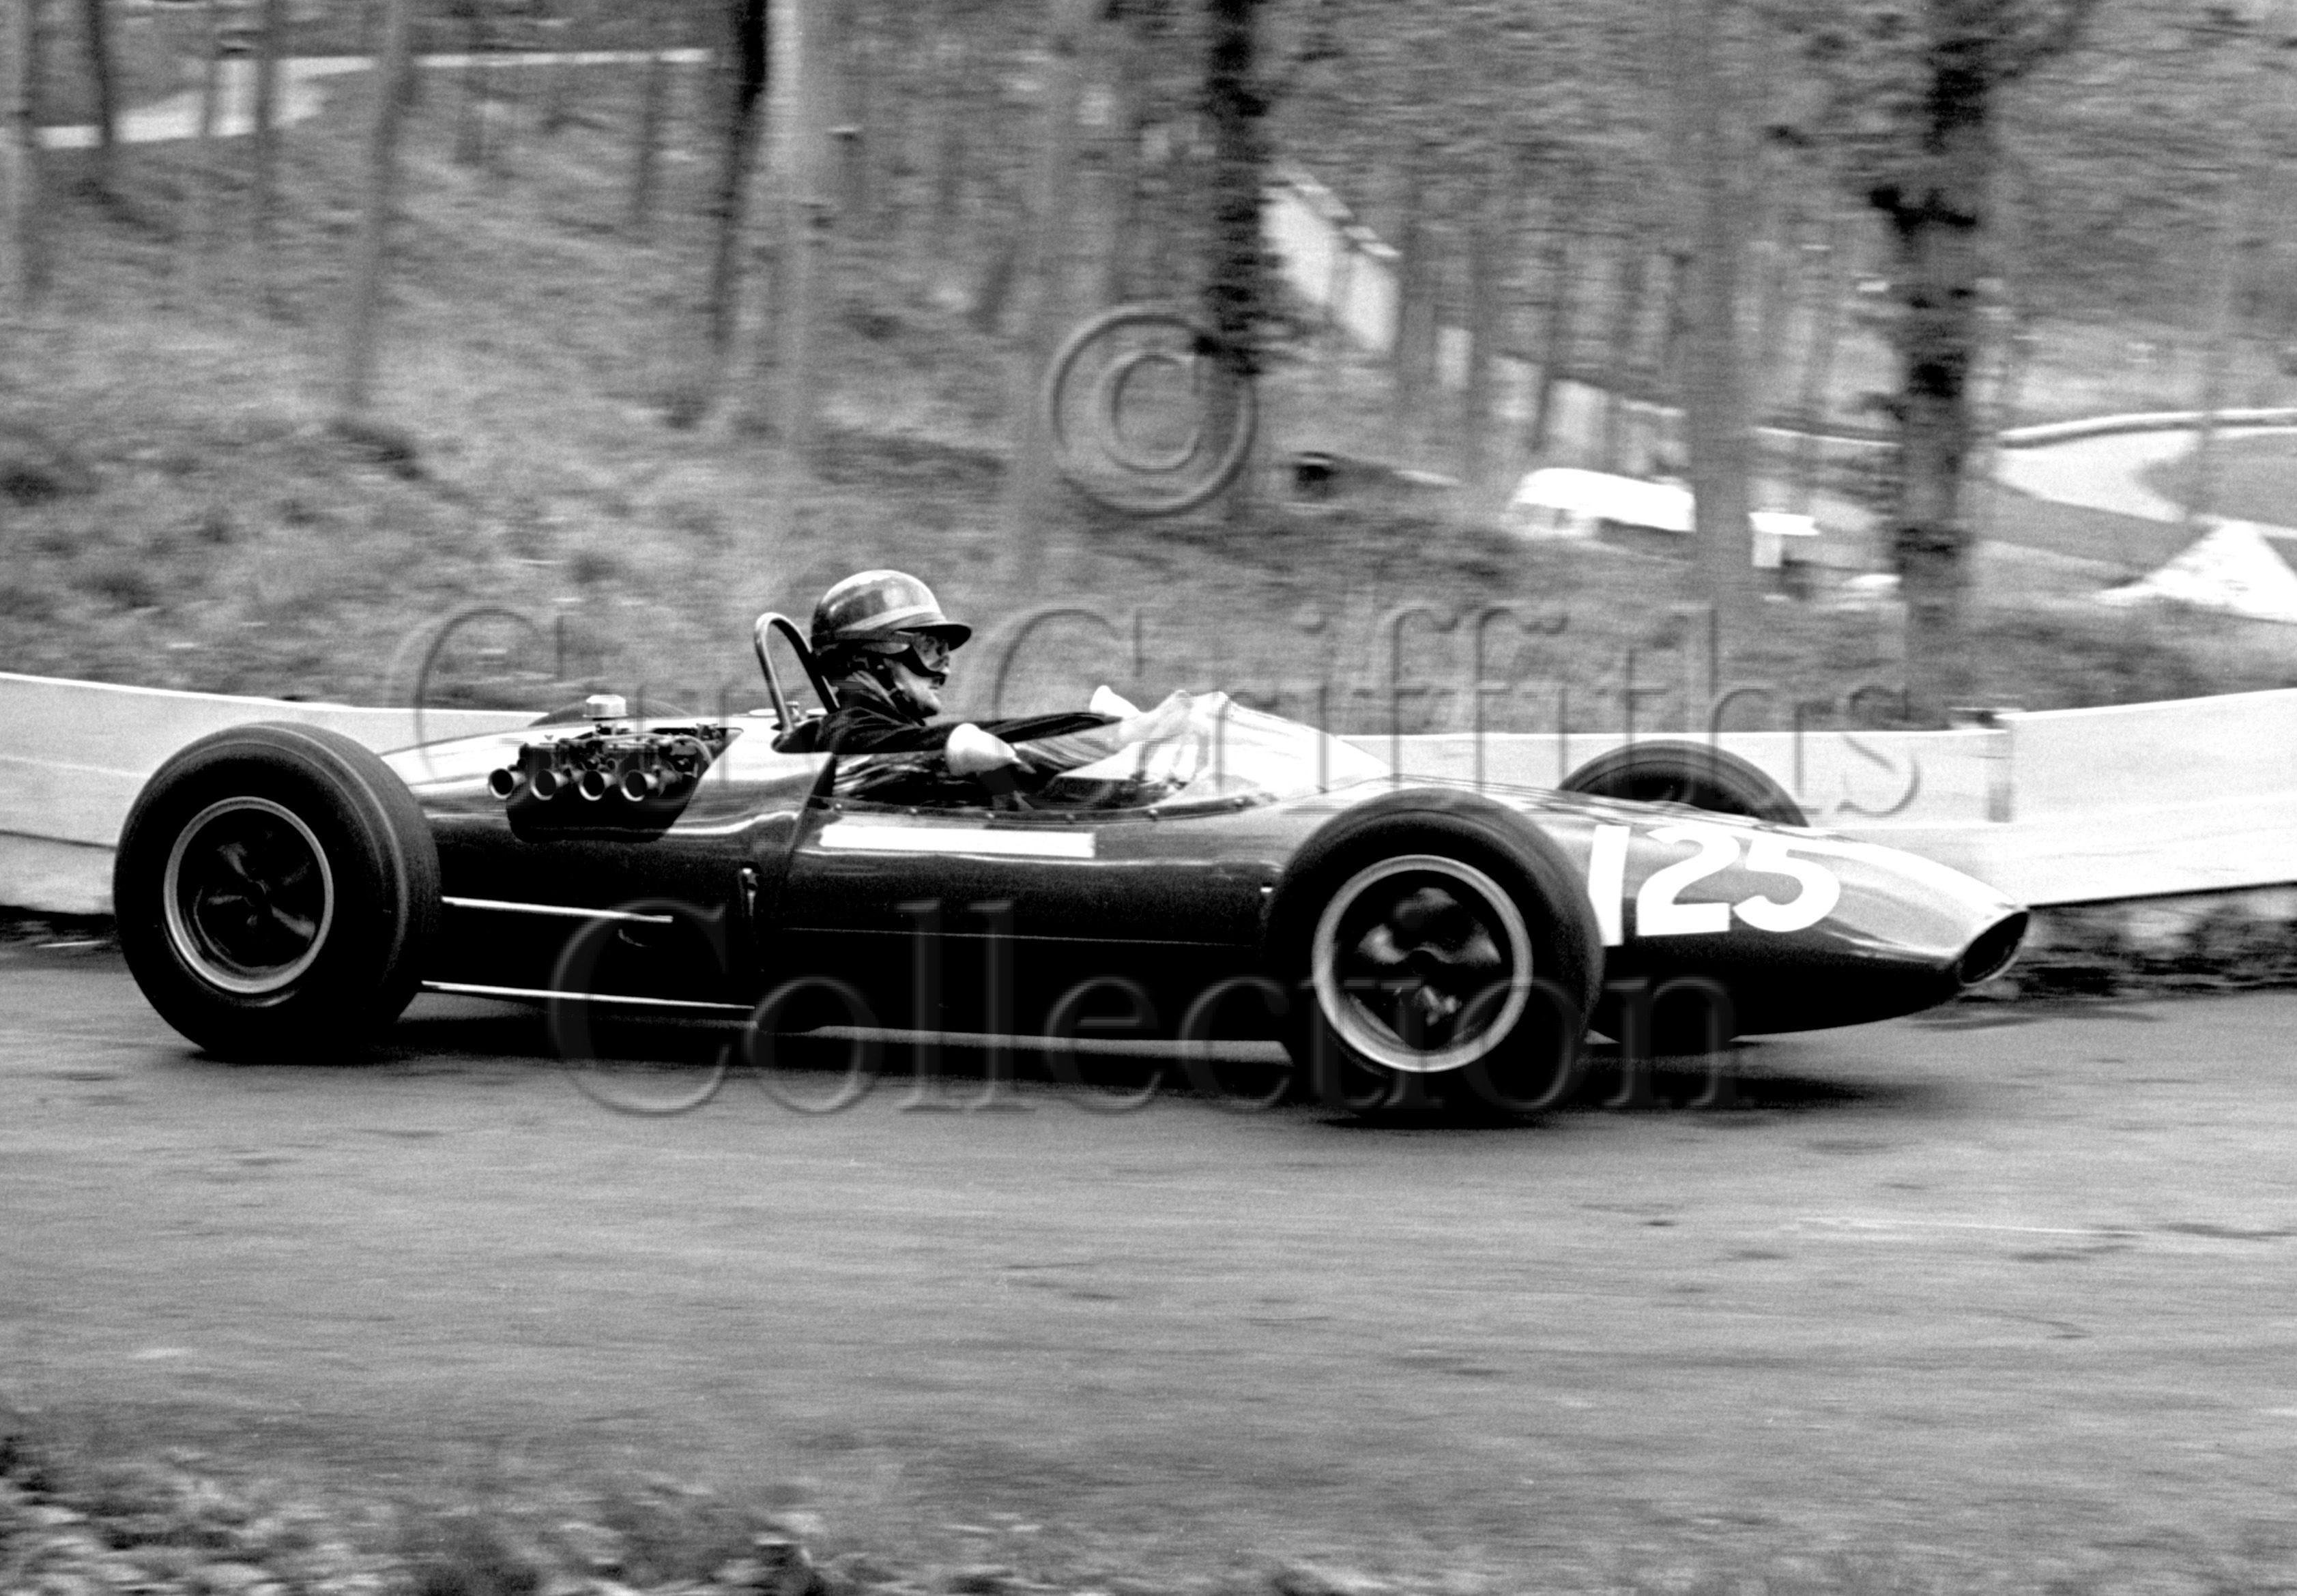 82-321–R-Sturgess–Lotus–Prescott–03-05-1964.jpg - The Guy Griffiths Collection